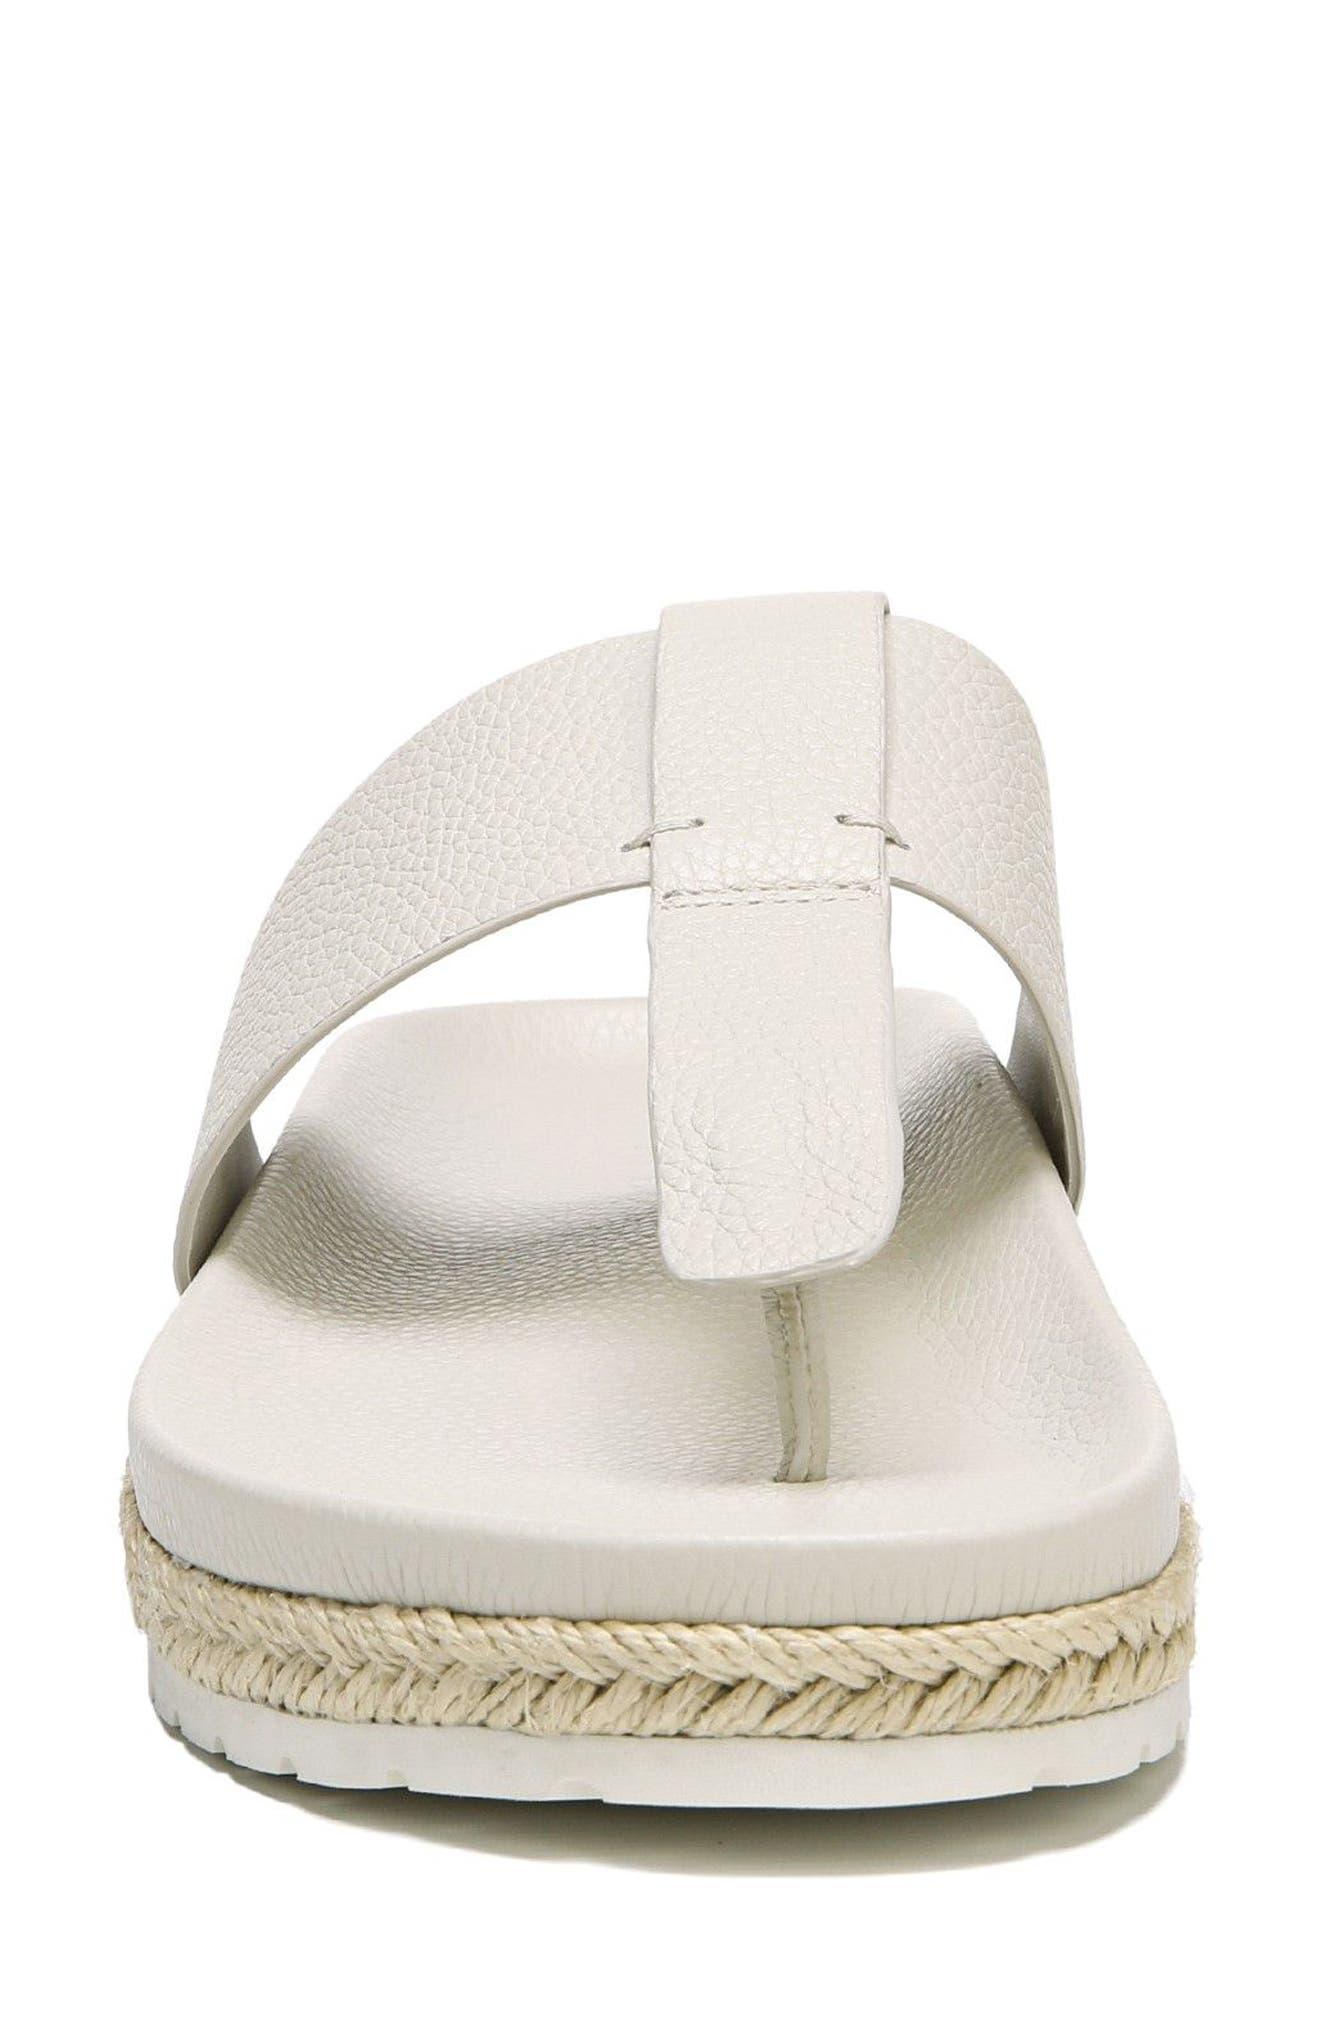 Avani T-Strap Flat Sandal,                             Alternate thumbnail 4, color,                             Oyster